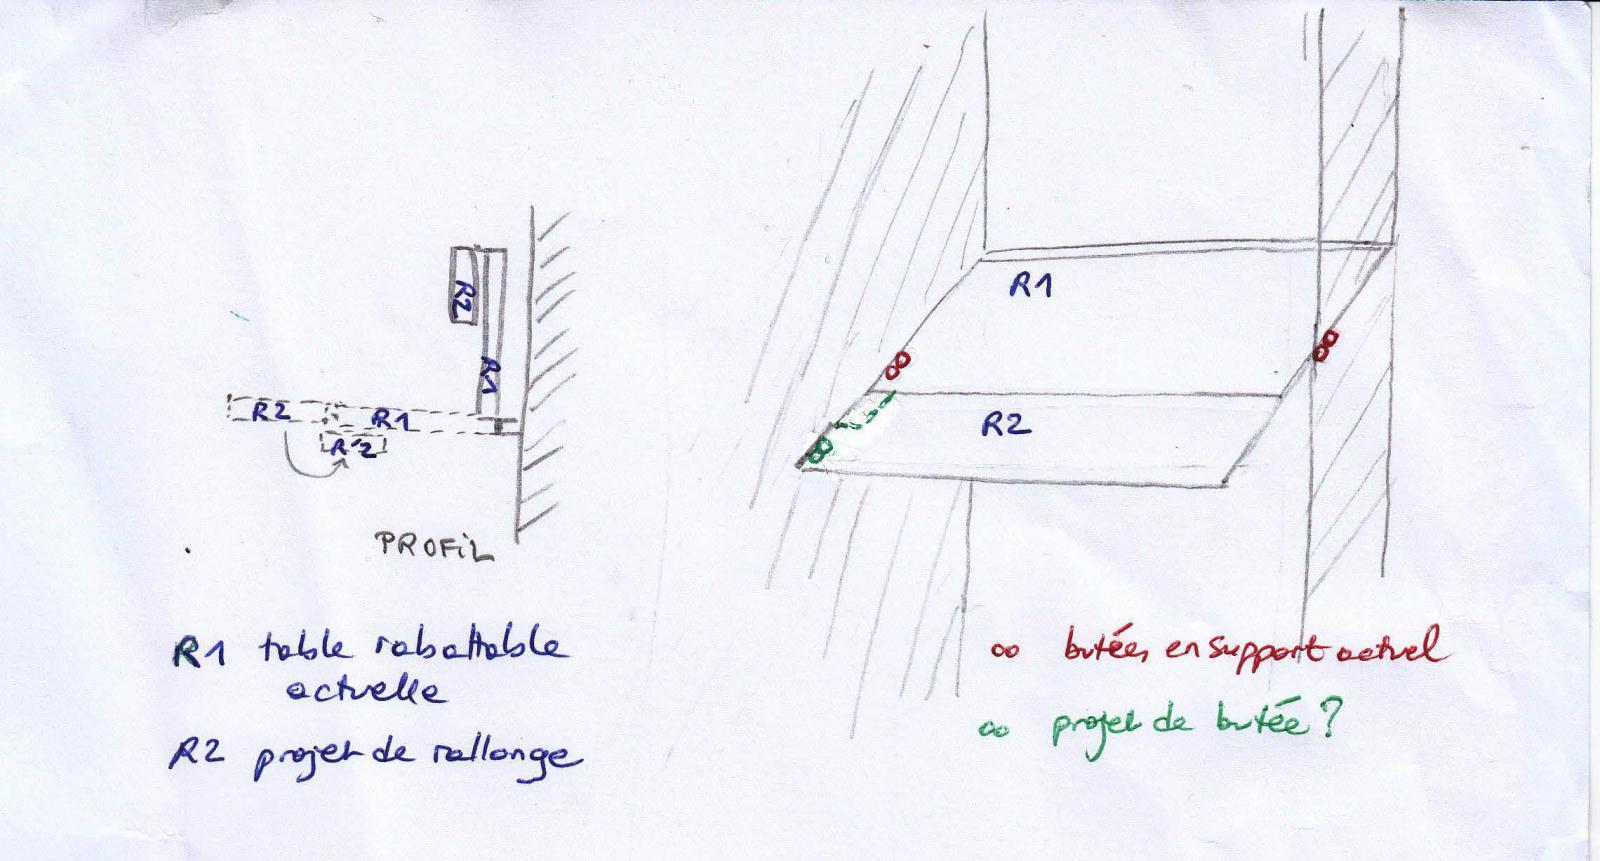 rallonge pour table rabattable. Black Bedroom Furniture Sets. Home Design Ideas